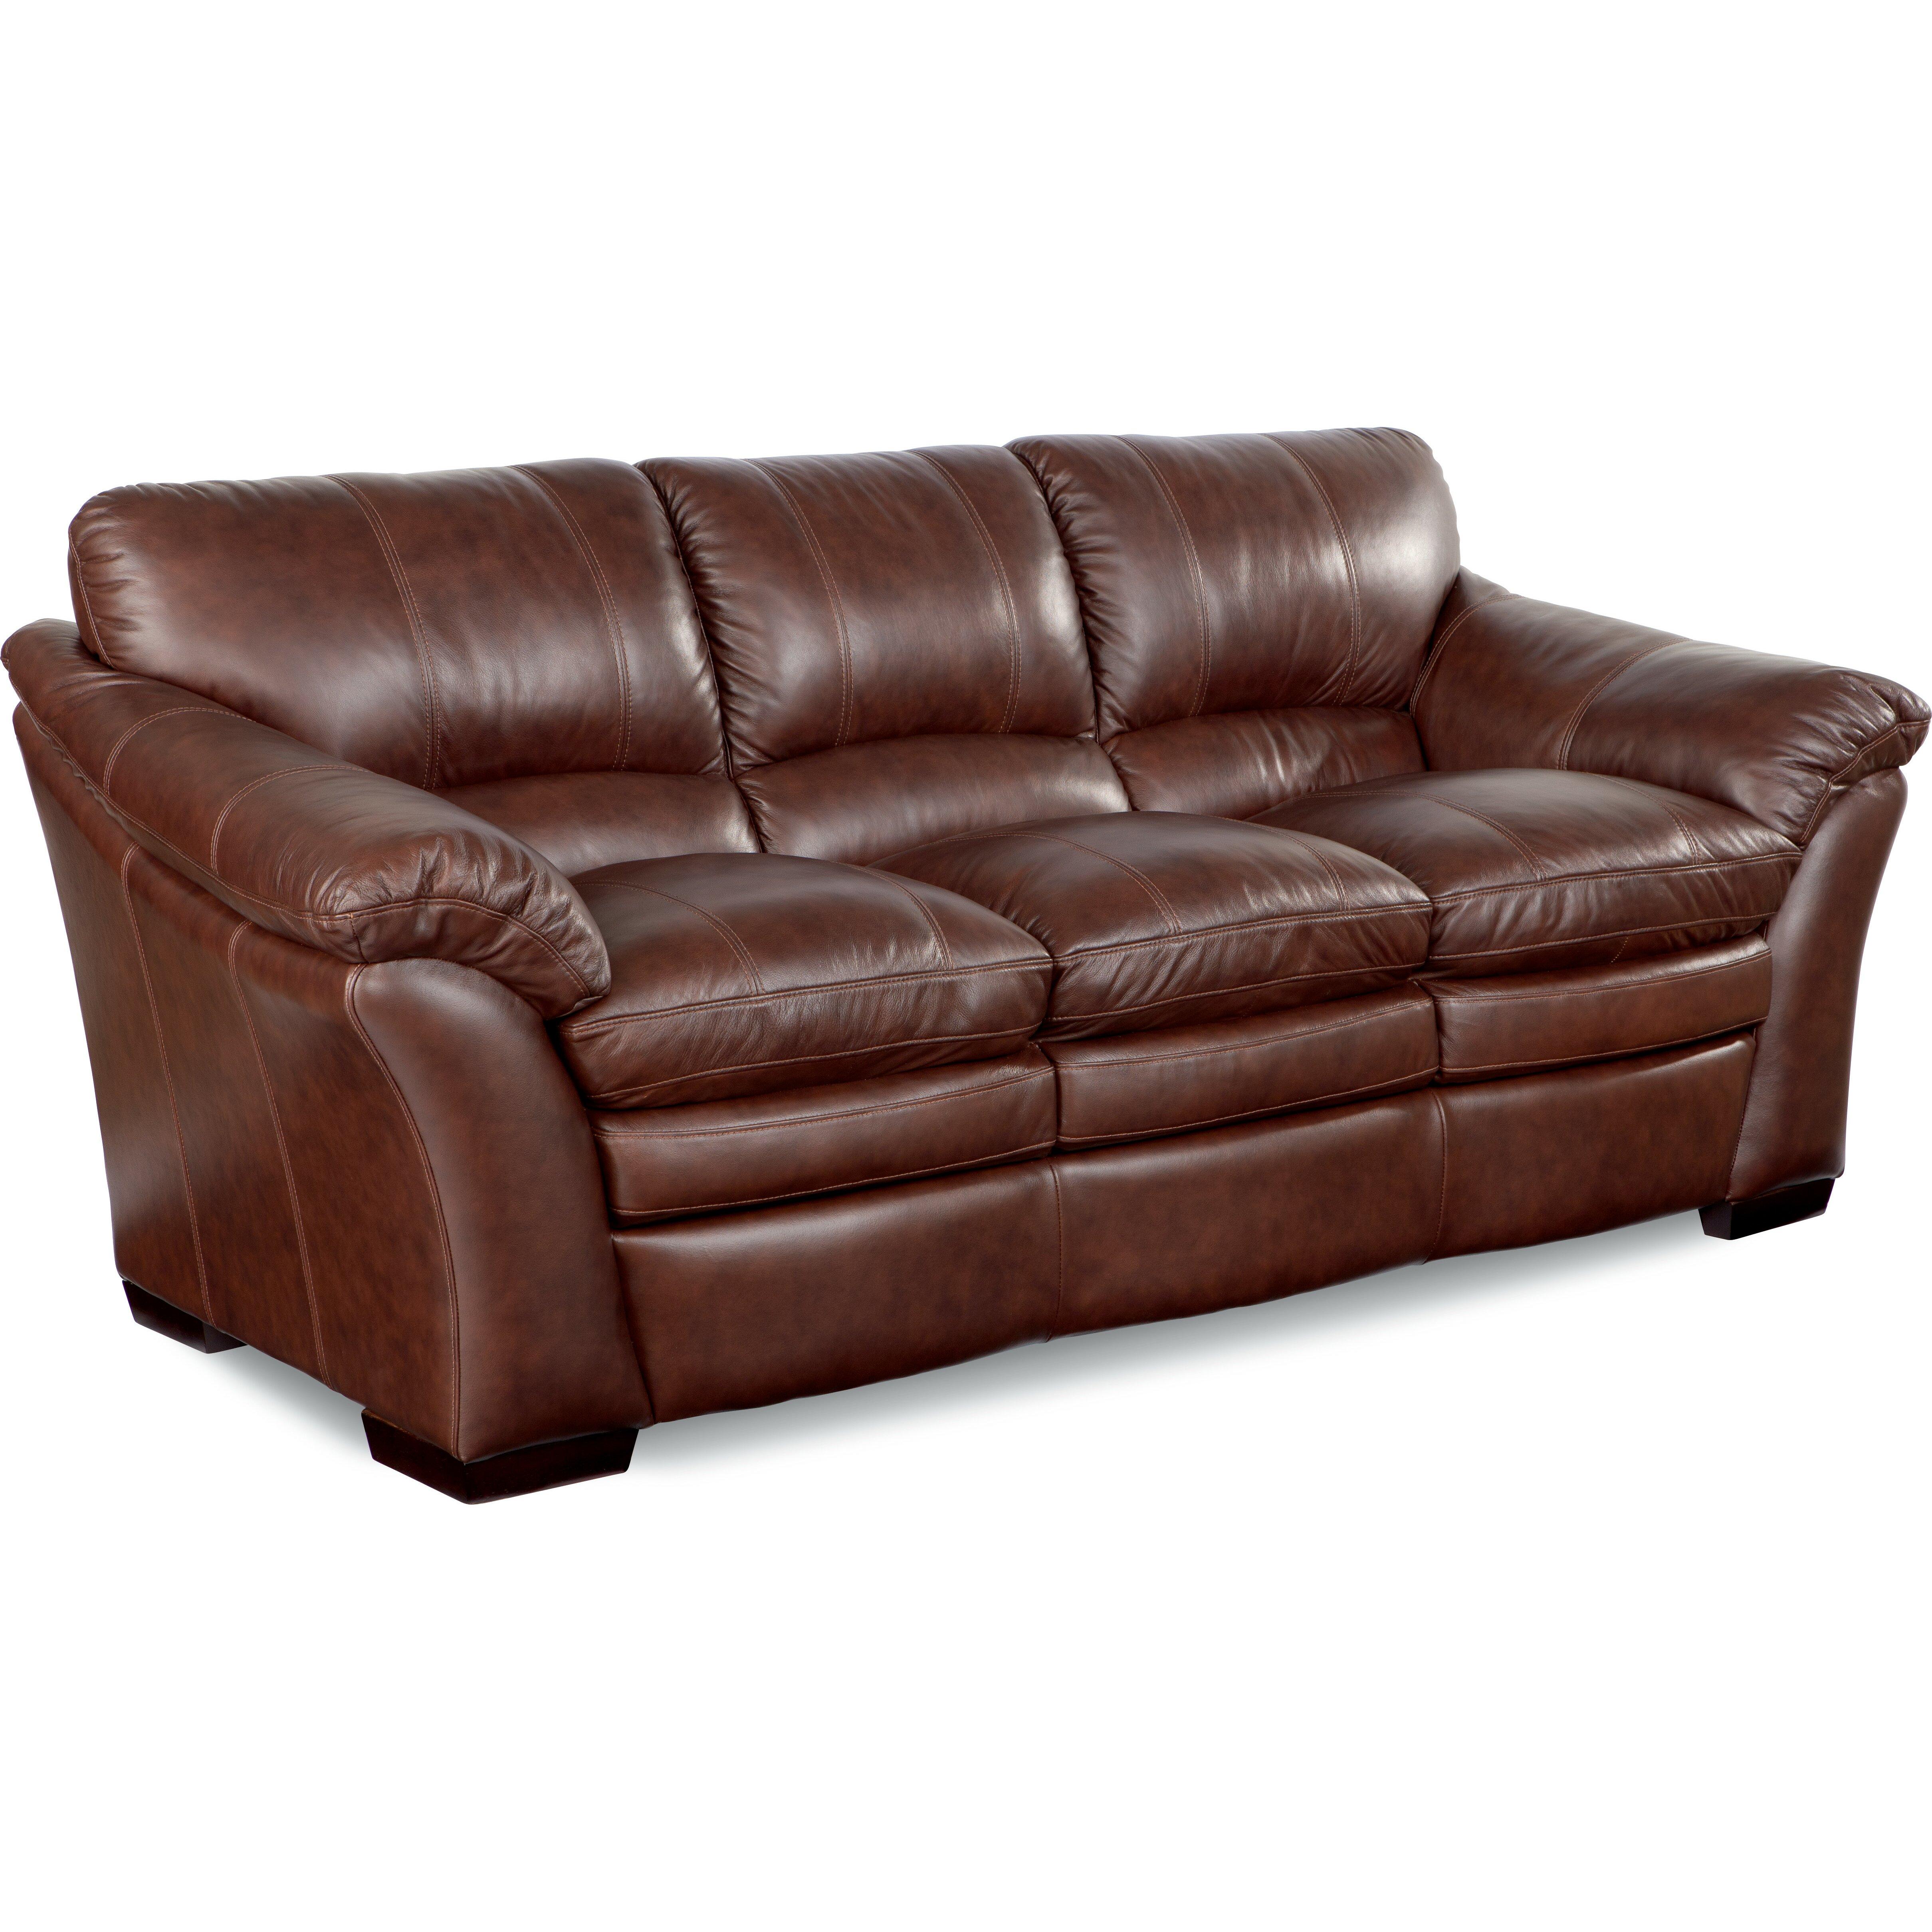 burton leather sofa